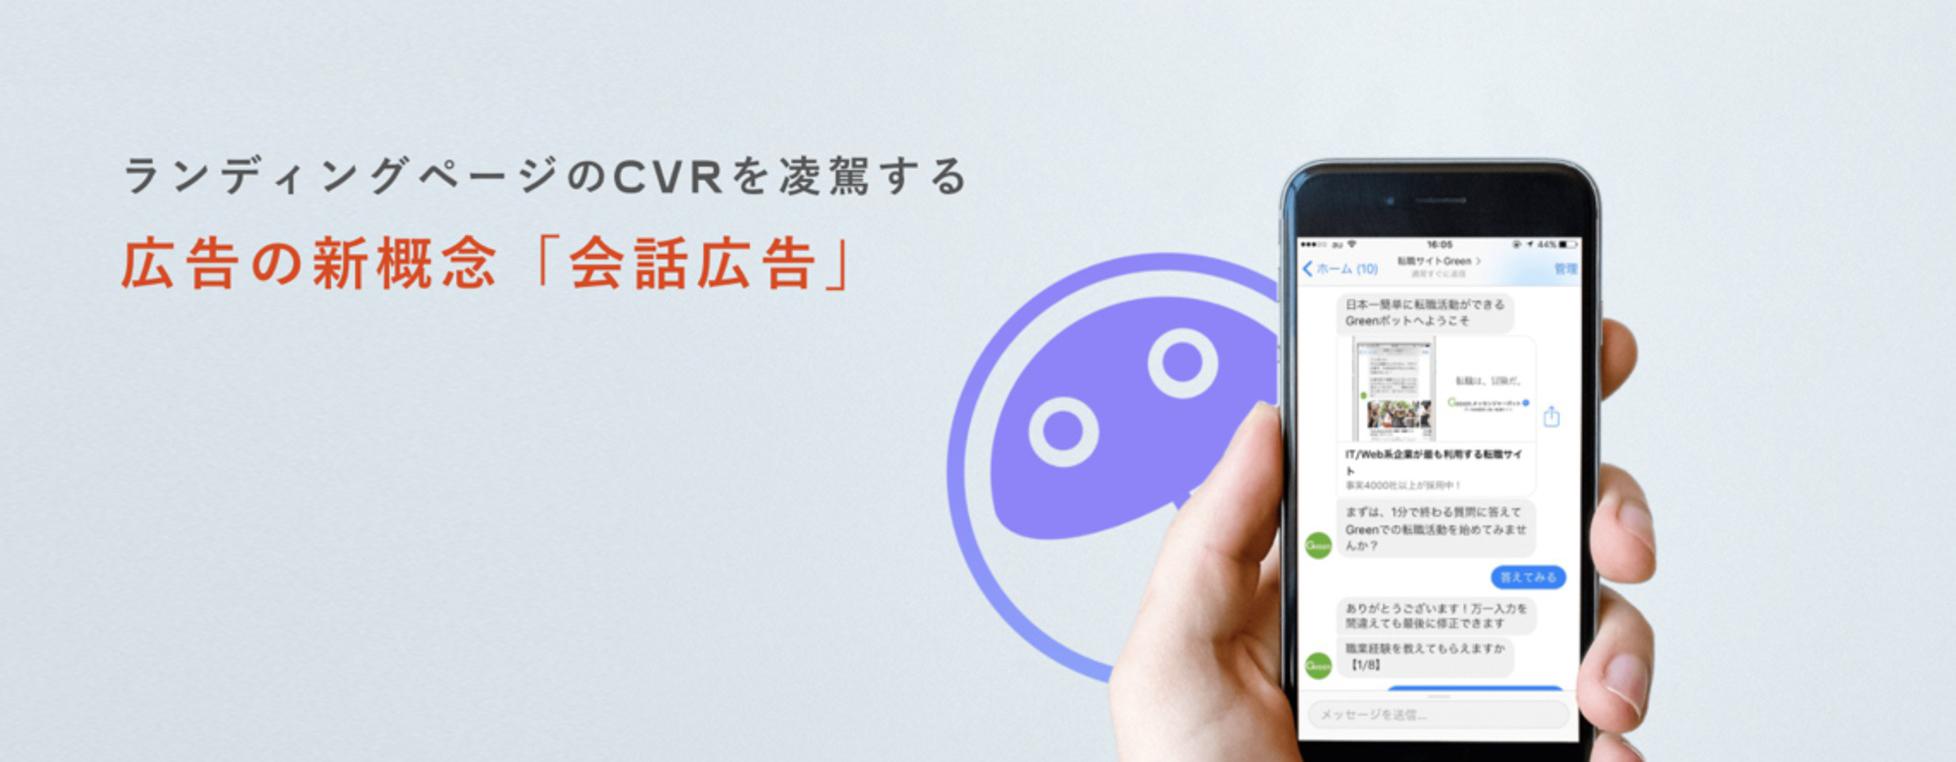 Facebook Messengerを活用できる新しい会員システム「fanp[ファンプ]」のiOSアプリ開発